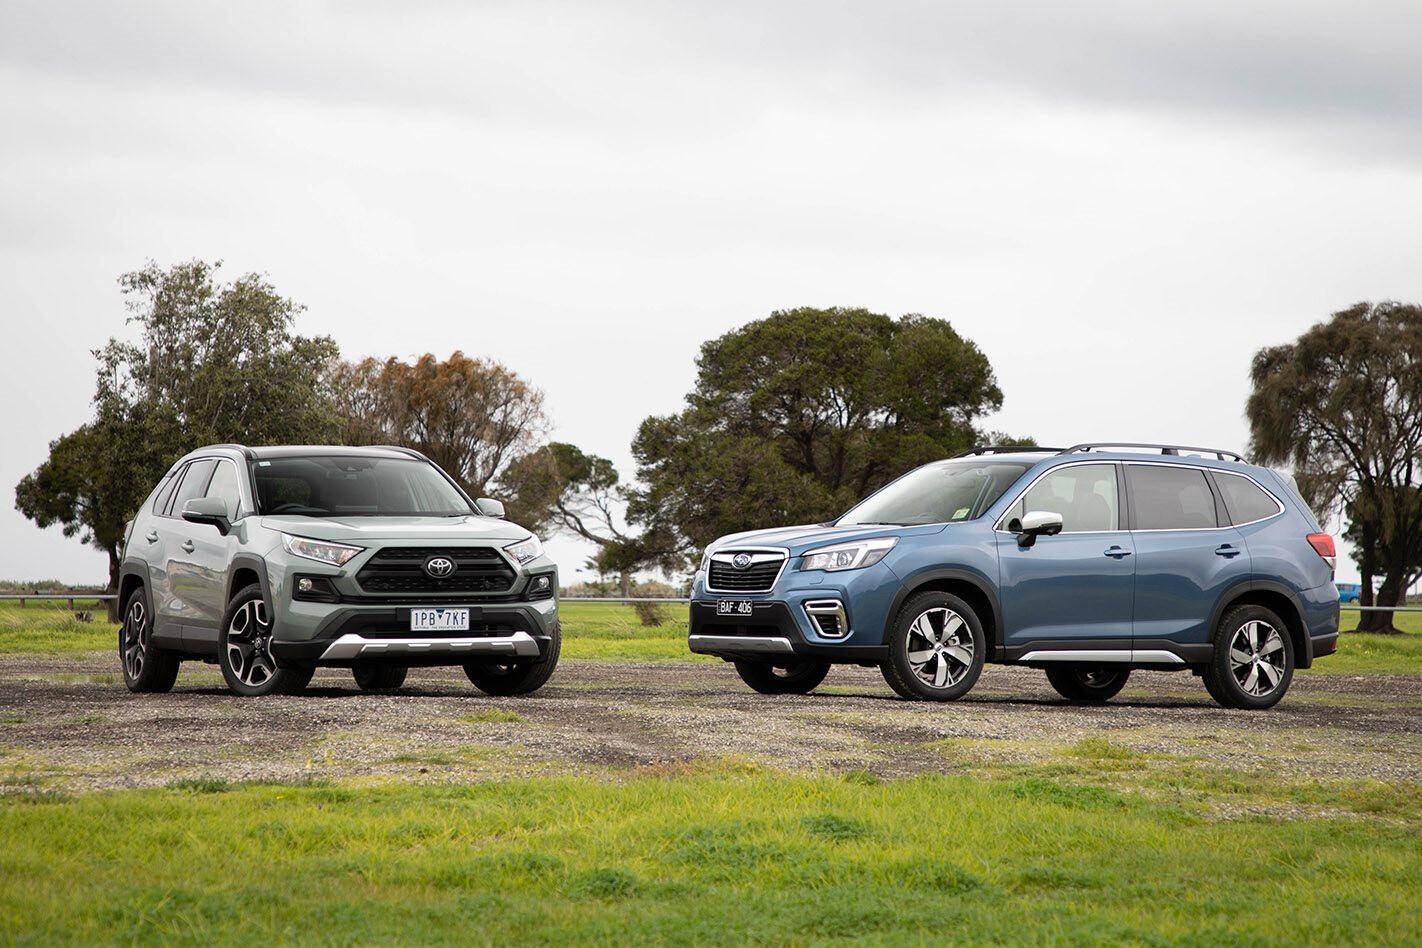 2019 Toyota Rav 4 Vs Subaru Forester Comparison 1 Jpg